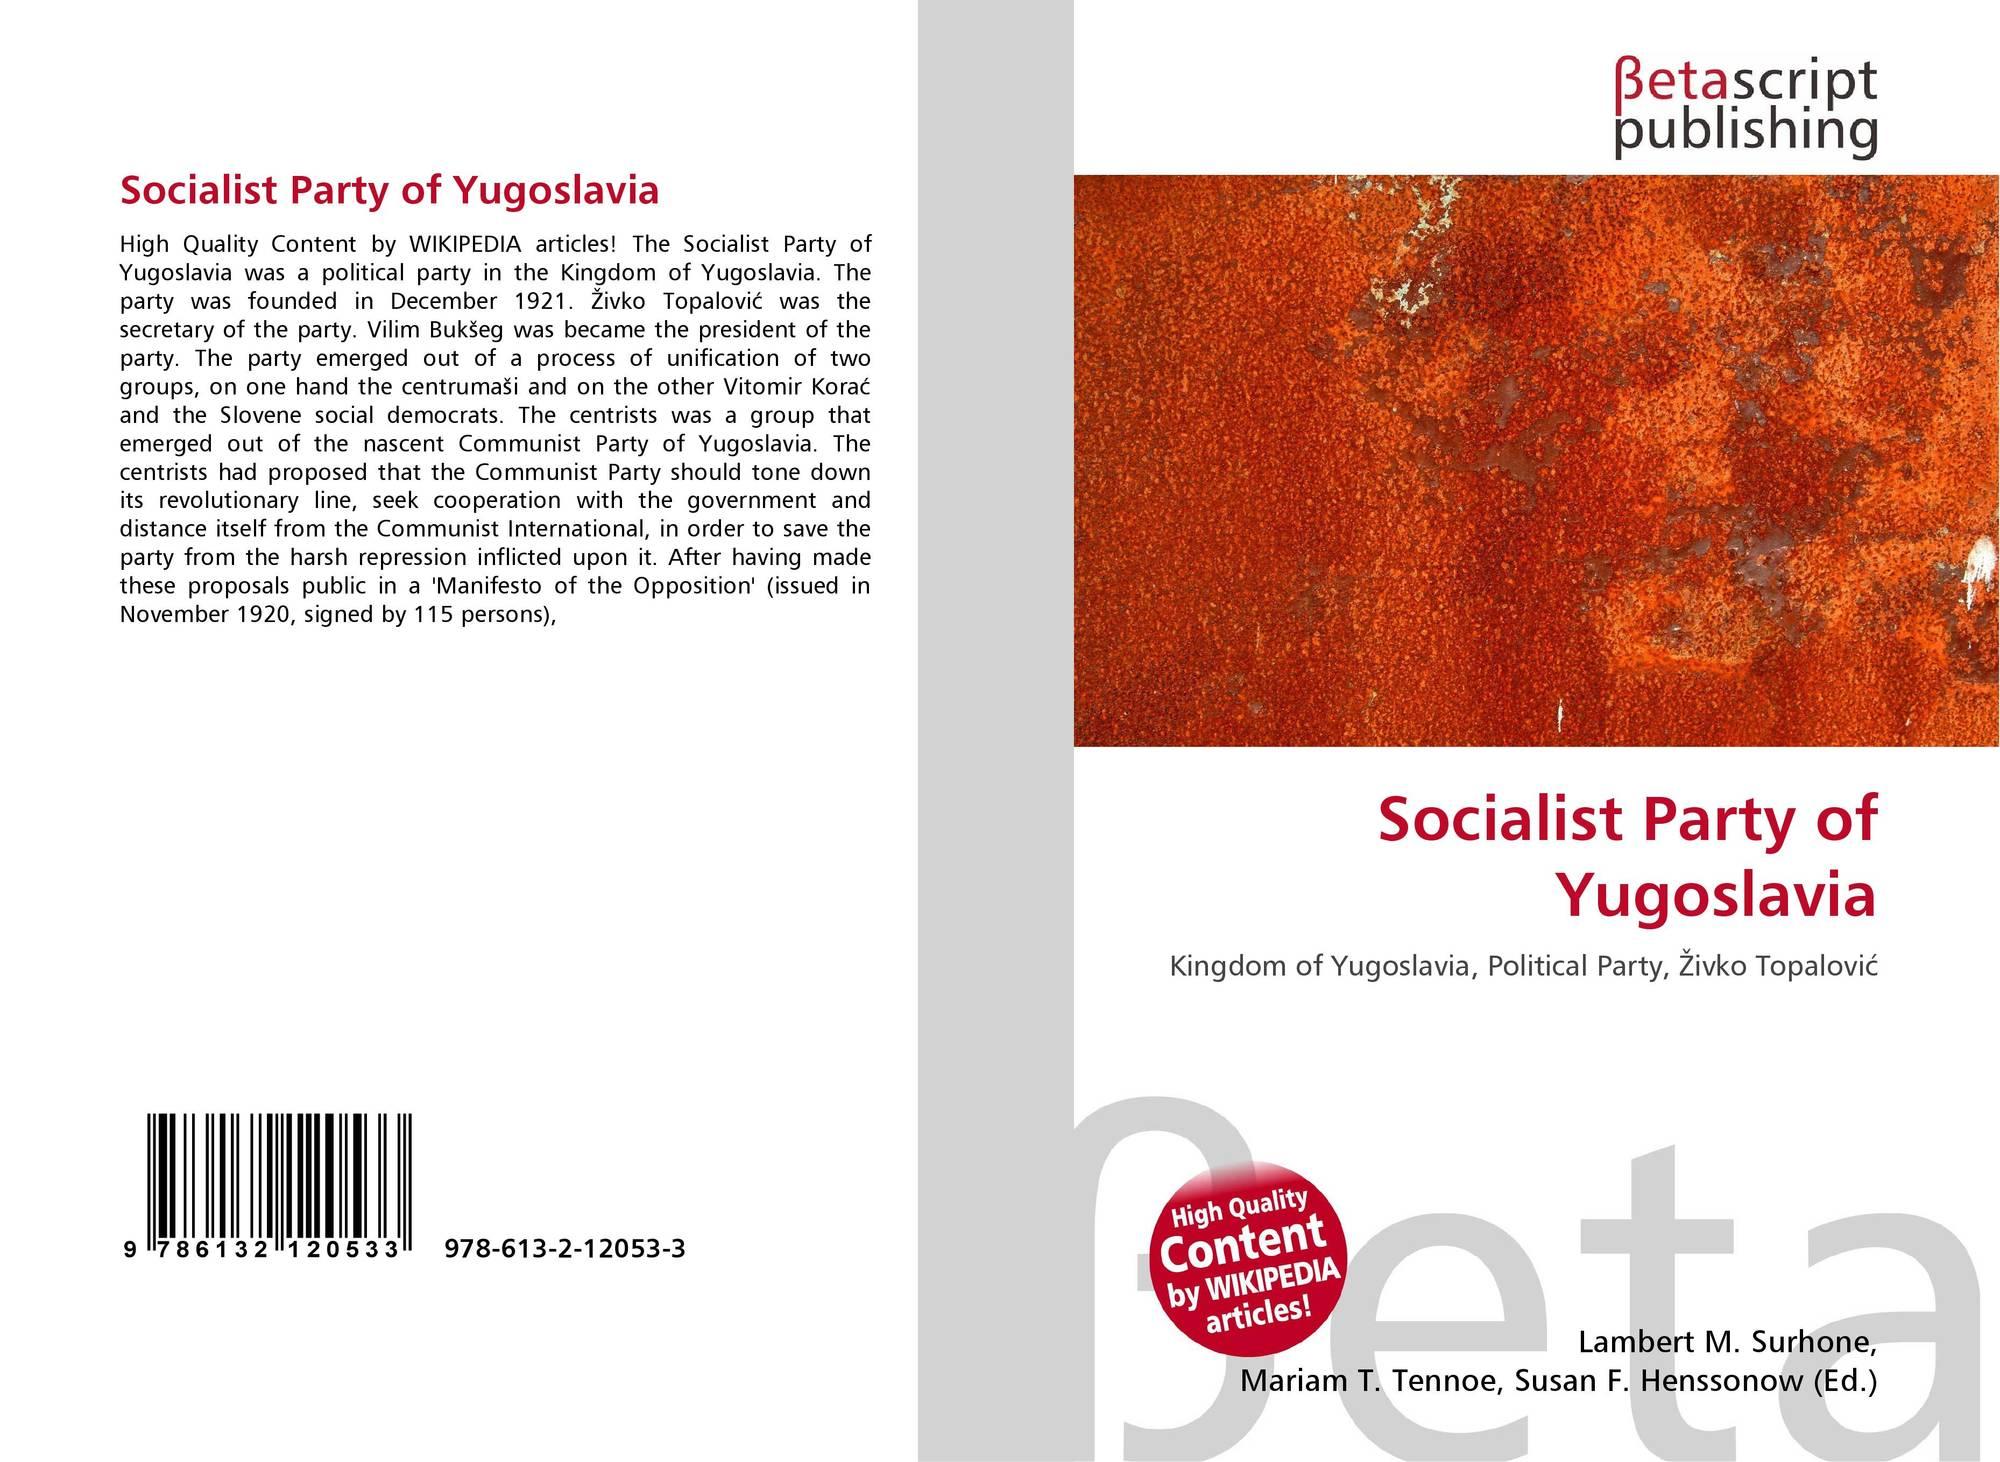 Bookcover of Socialist Party of Yugoslavia. Omni badge 9307e2201e5f762643a64561af3456be64a87707602f96b92ef18a9bbcada116